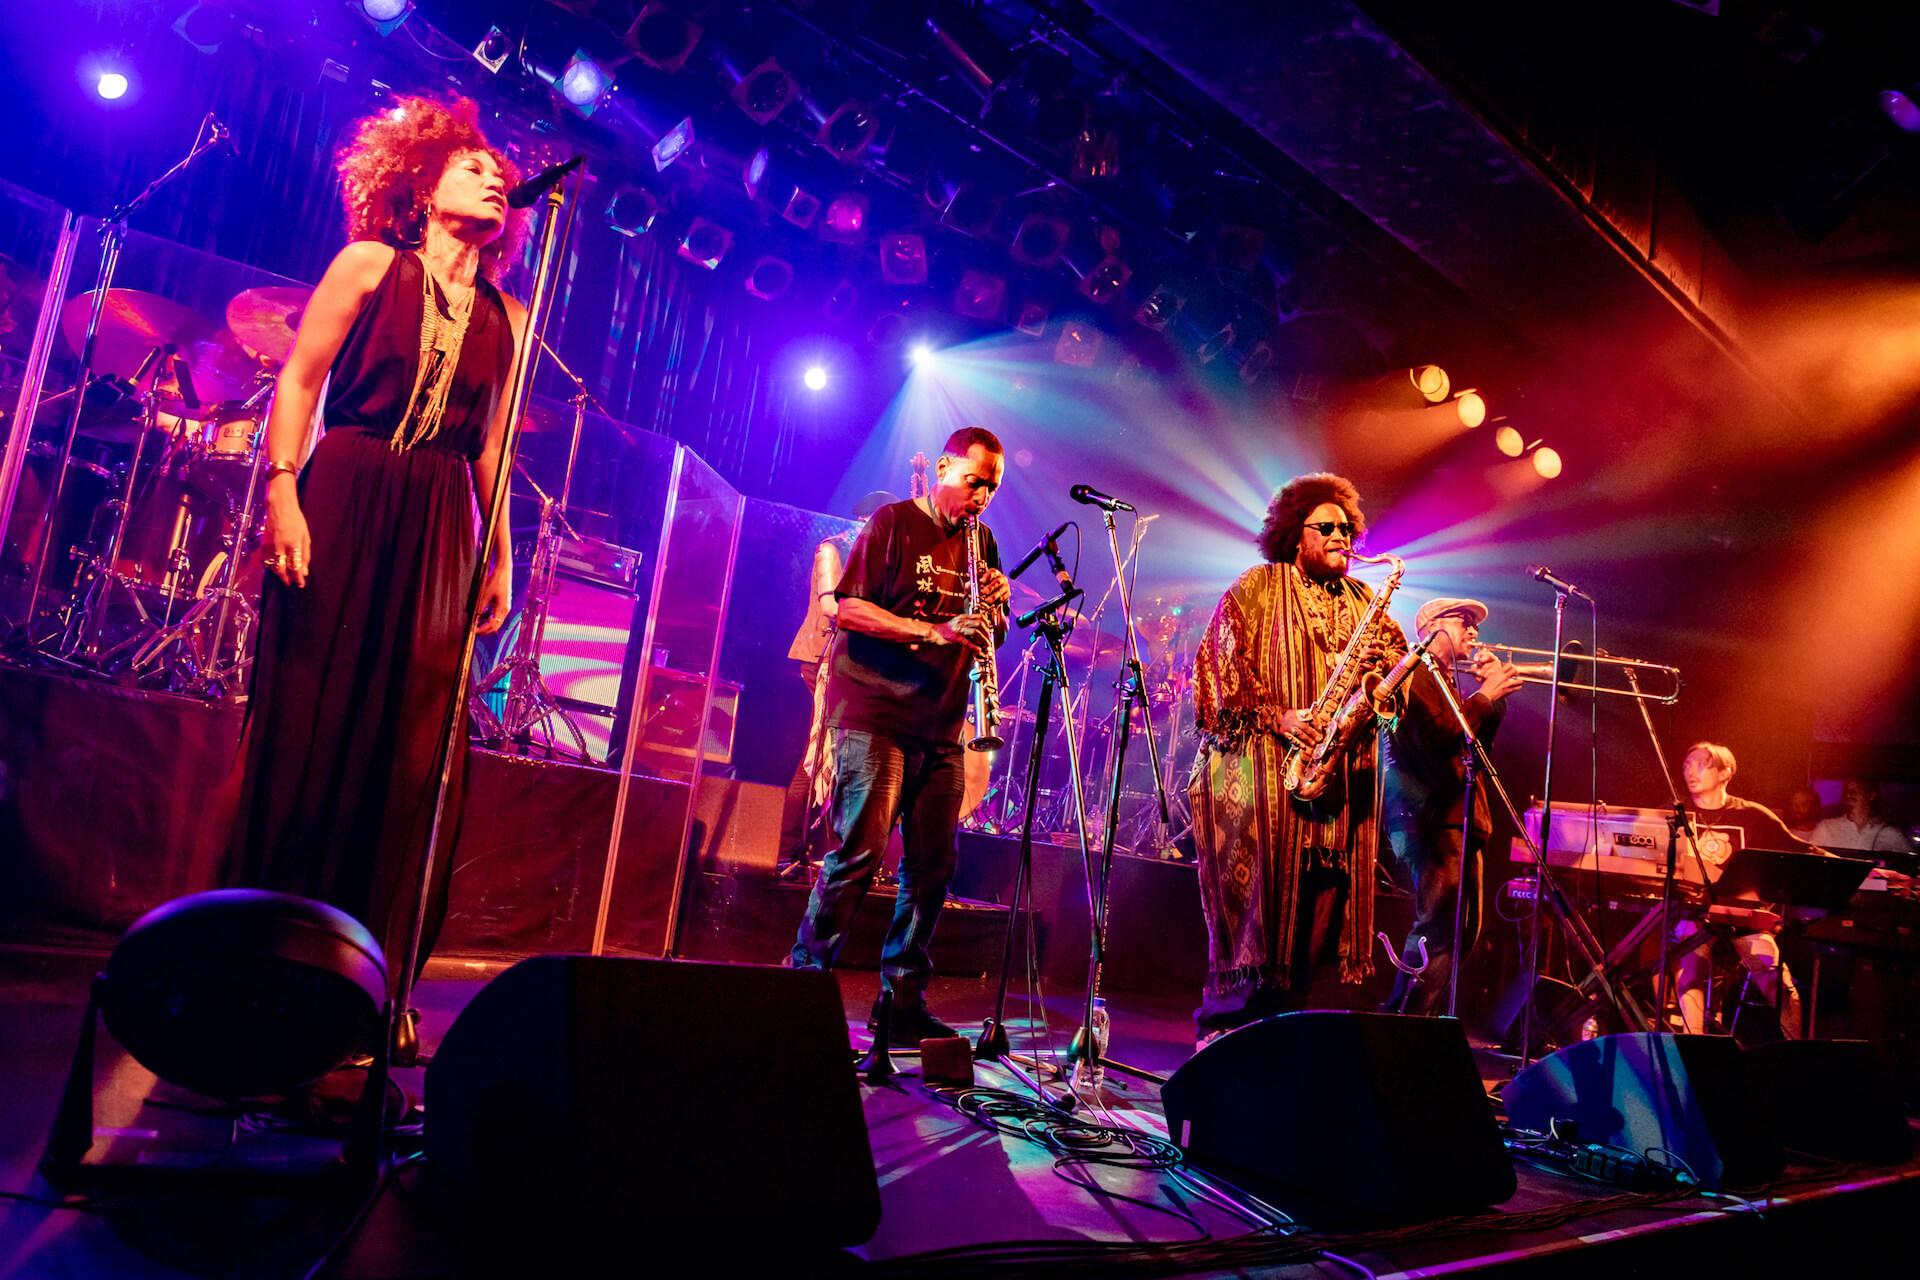 Kamasi Washington ライブレポート|「ブラック・エンターテインメント」の伝統を今に受け継ぐ見事なショウ music190903-kamasiwashington-13